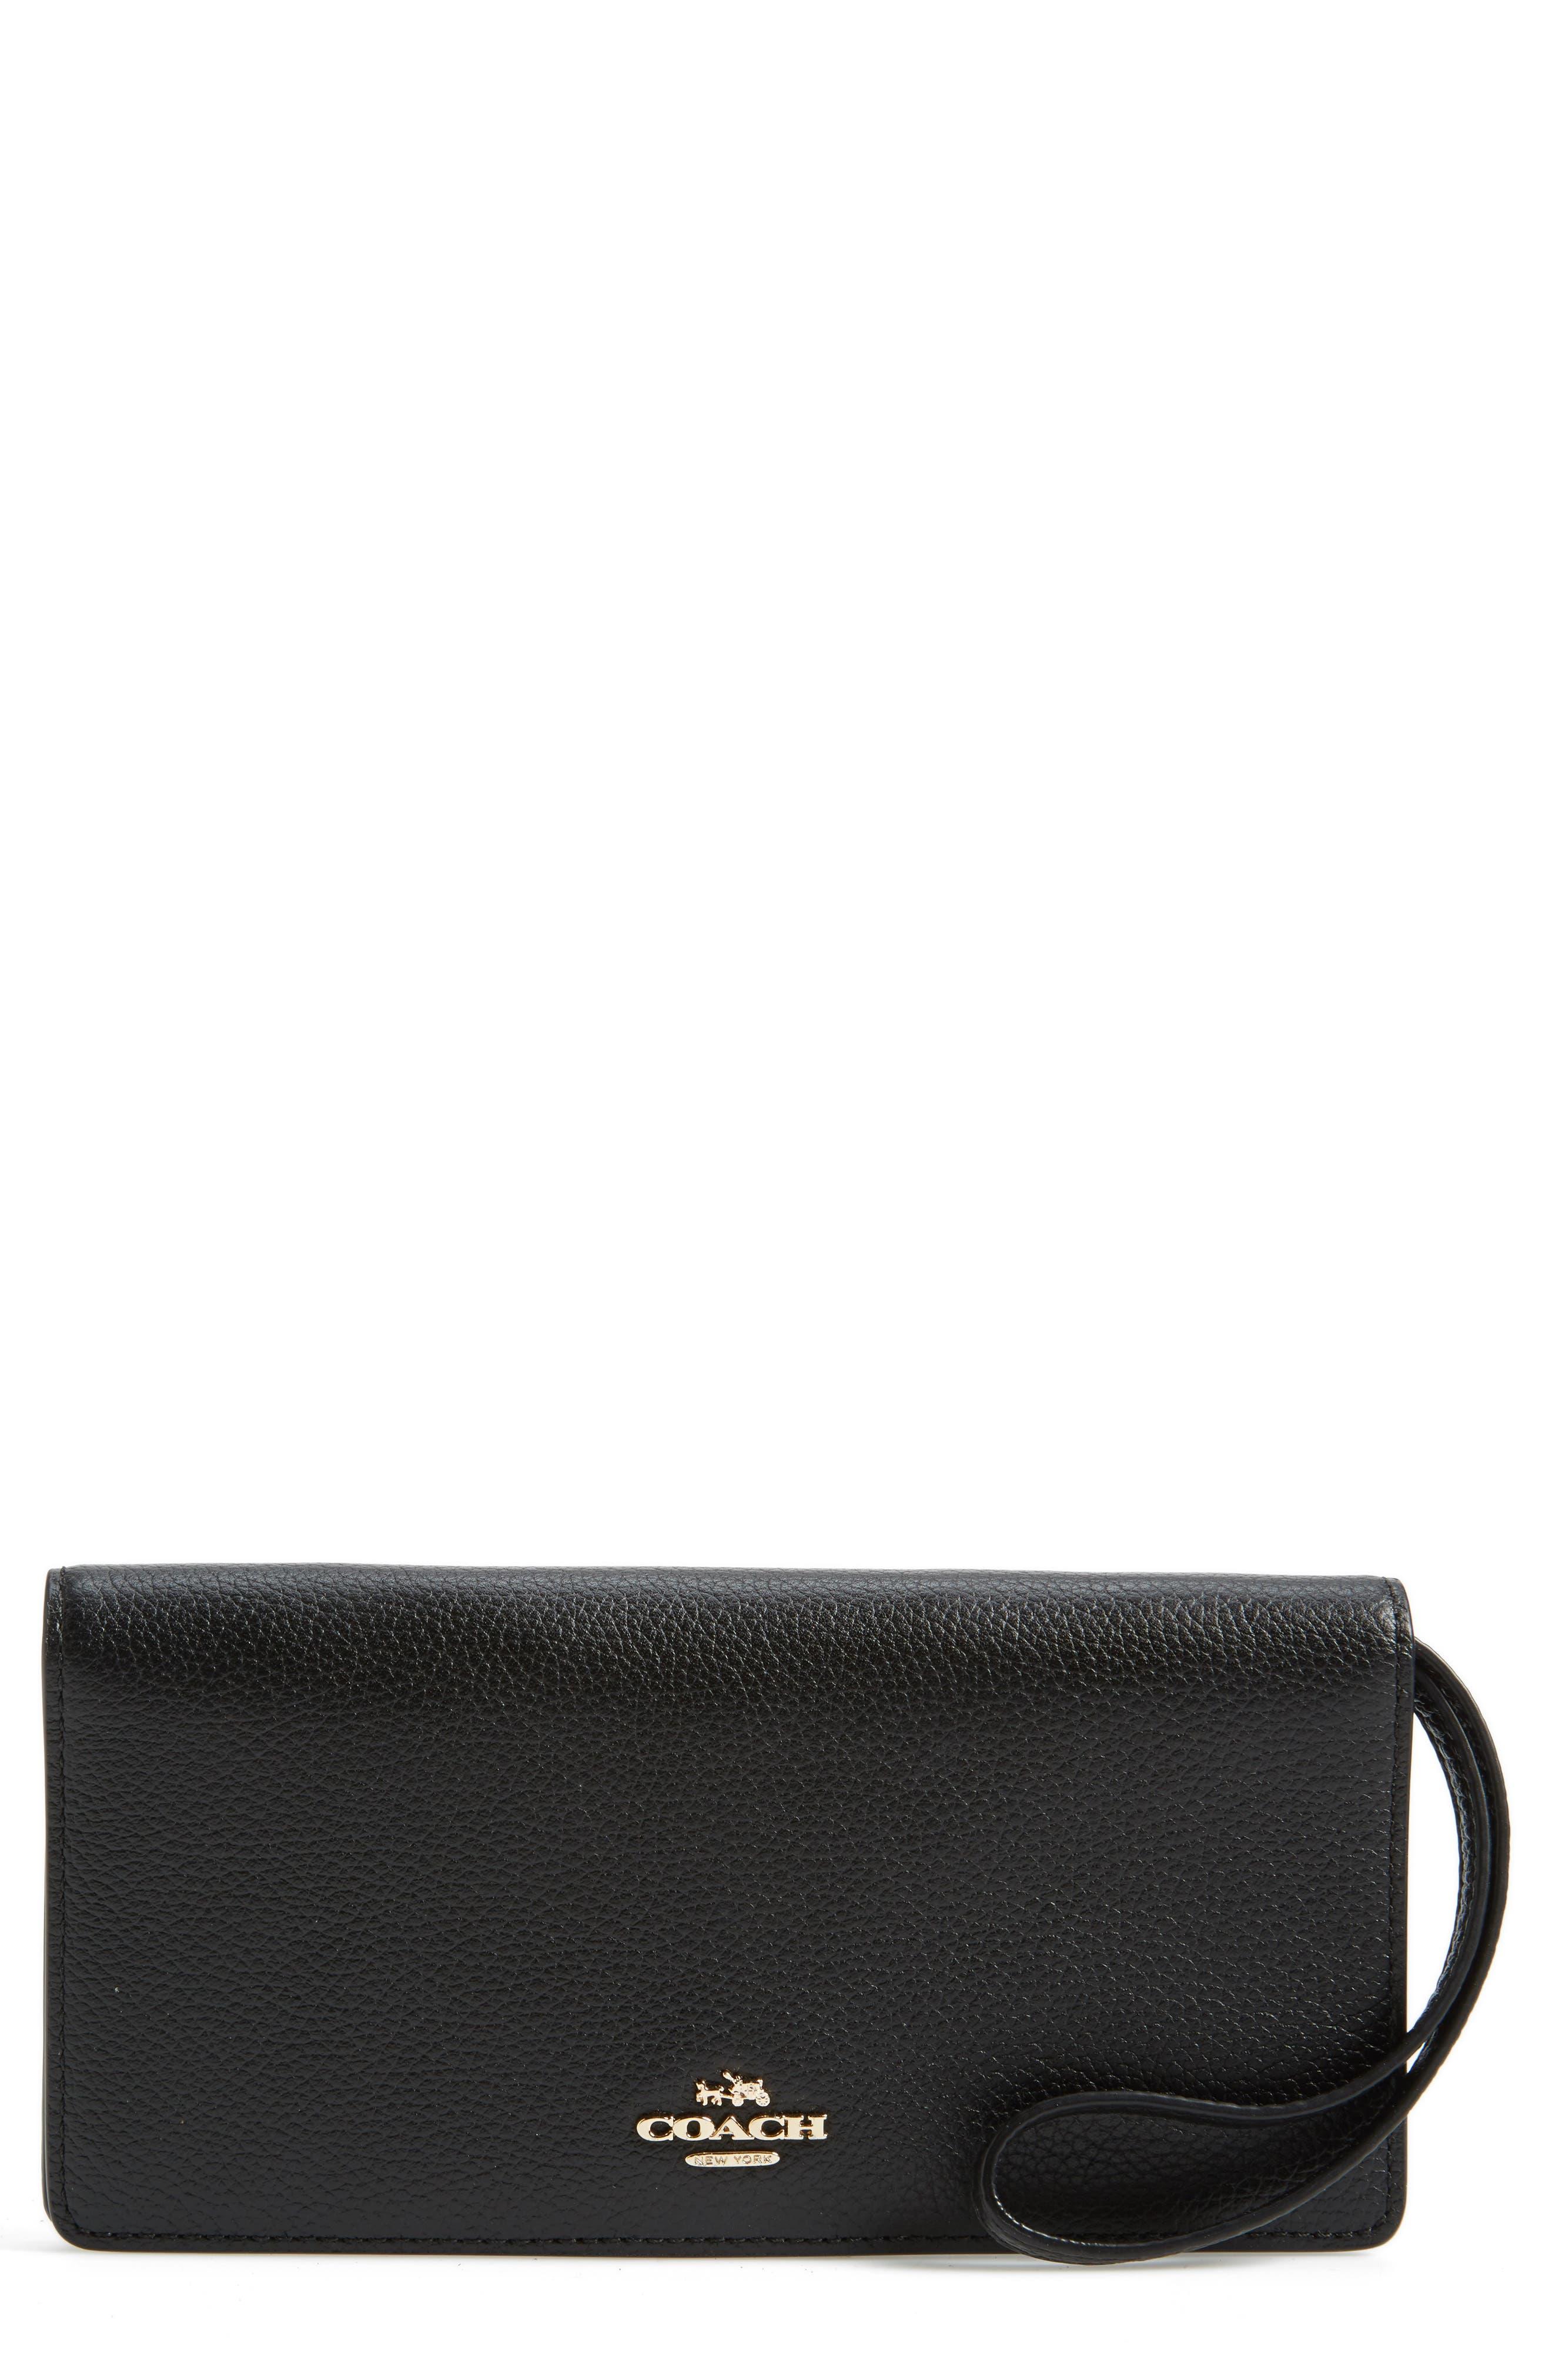 COACH Slim Calfskin Leather Wristlet